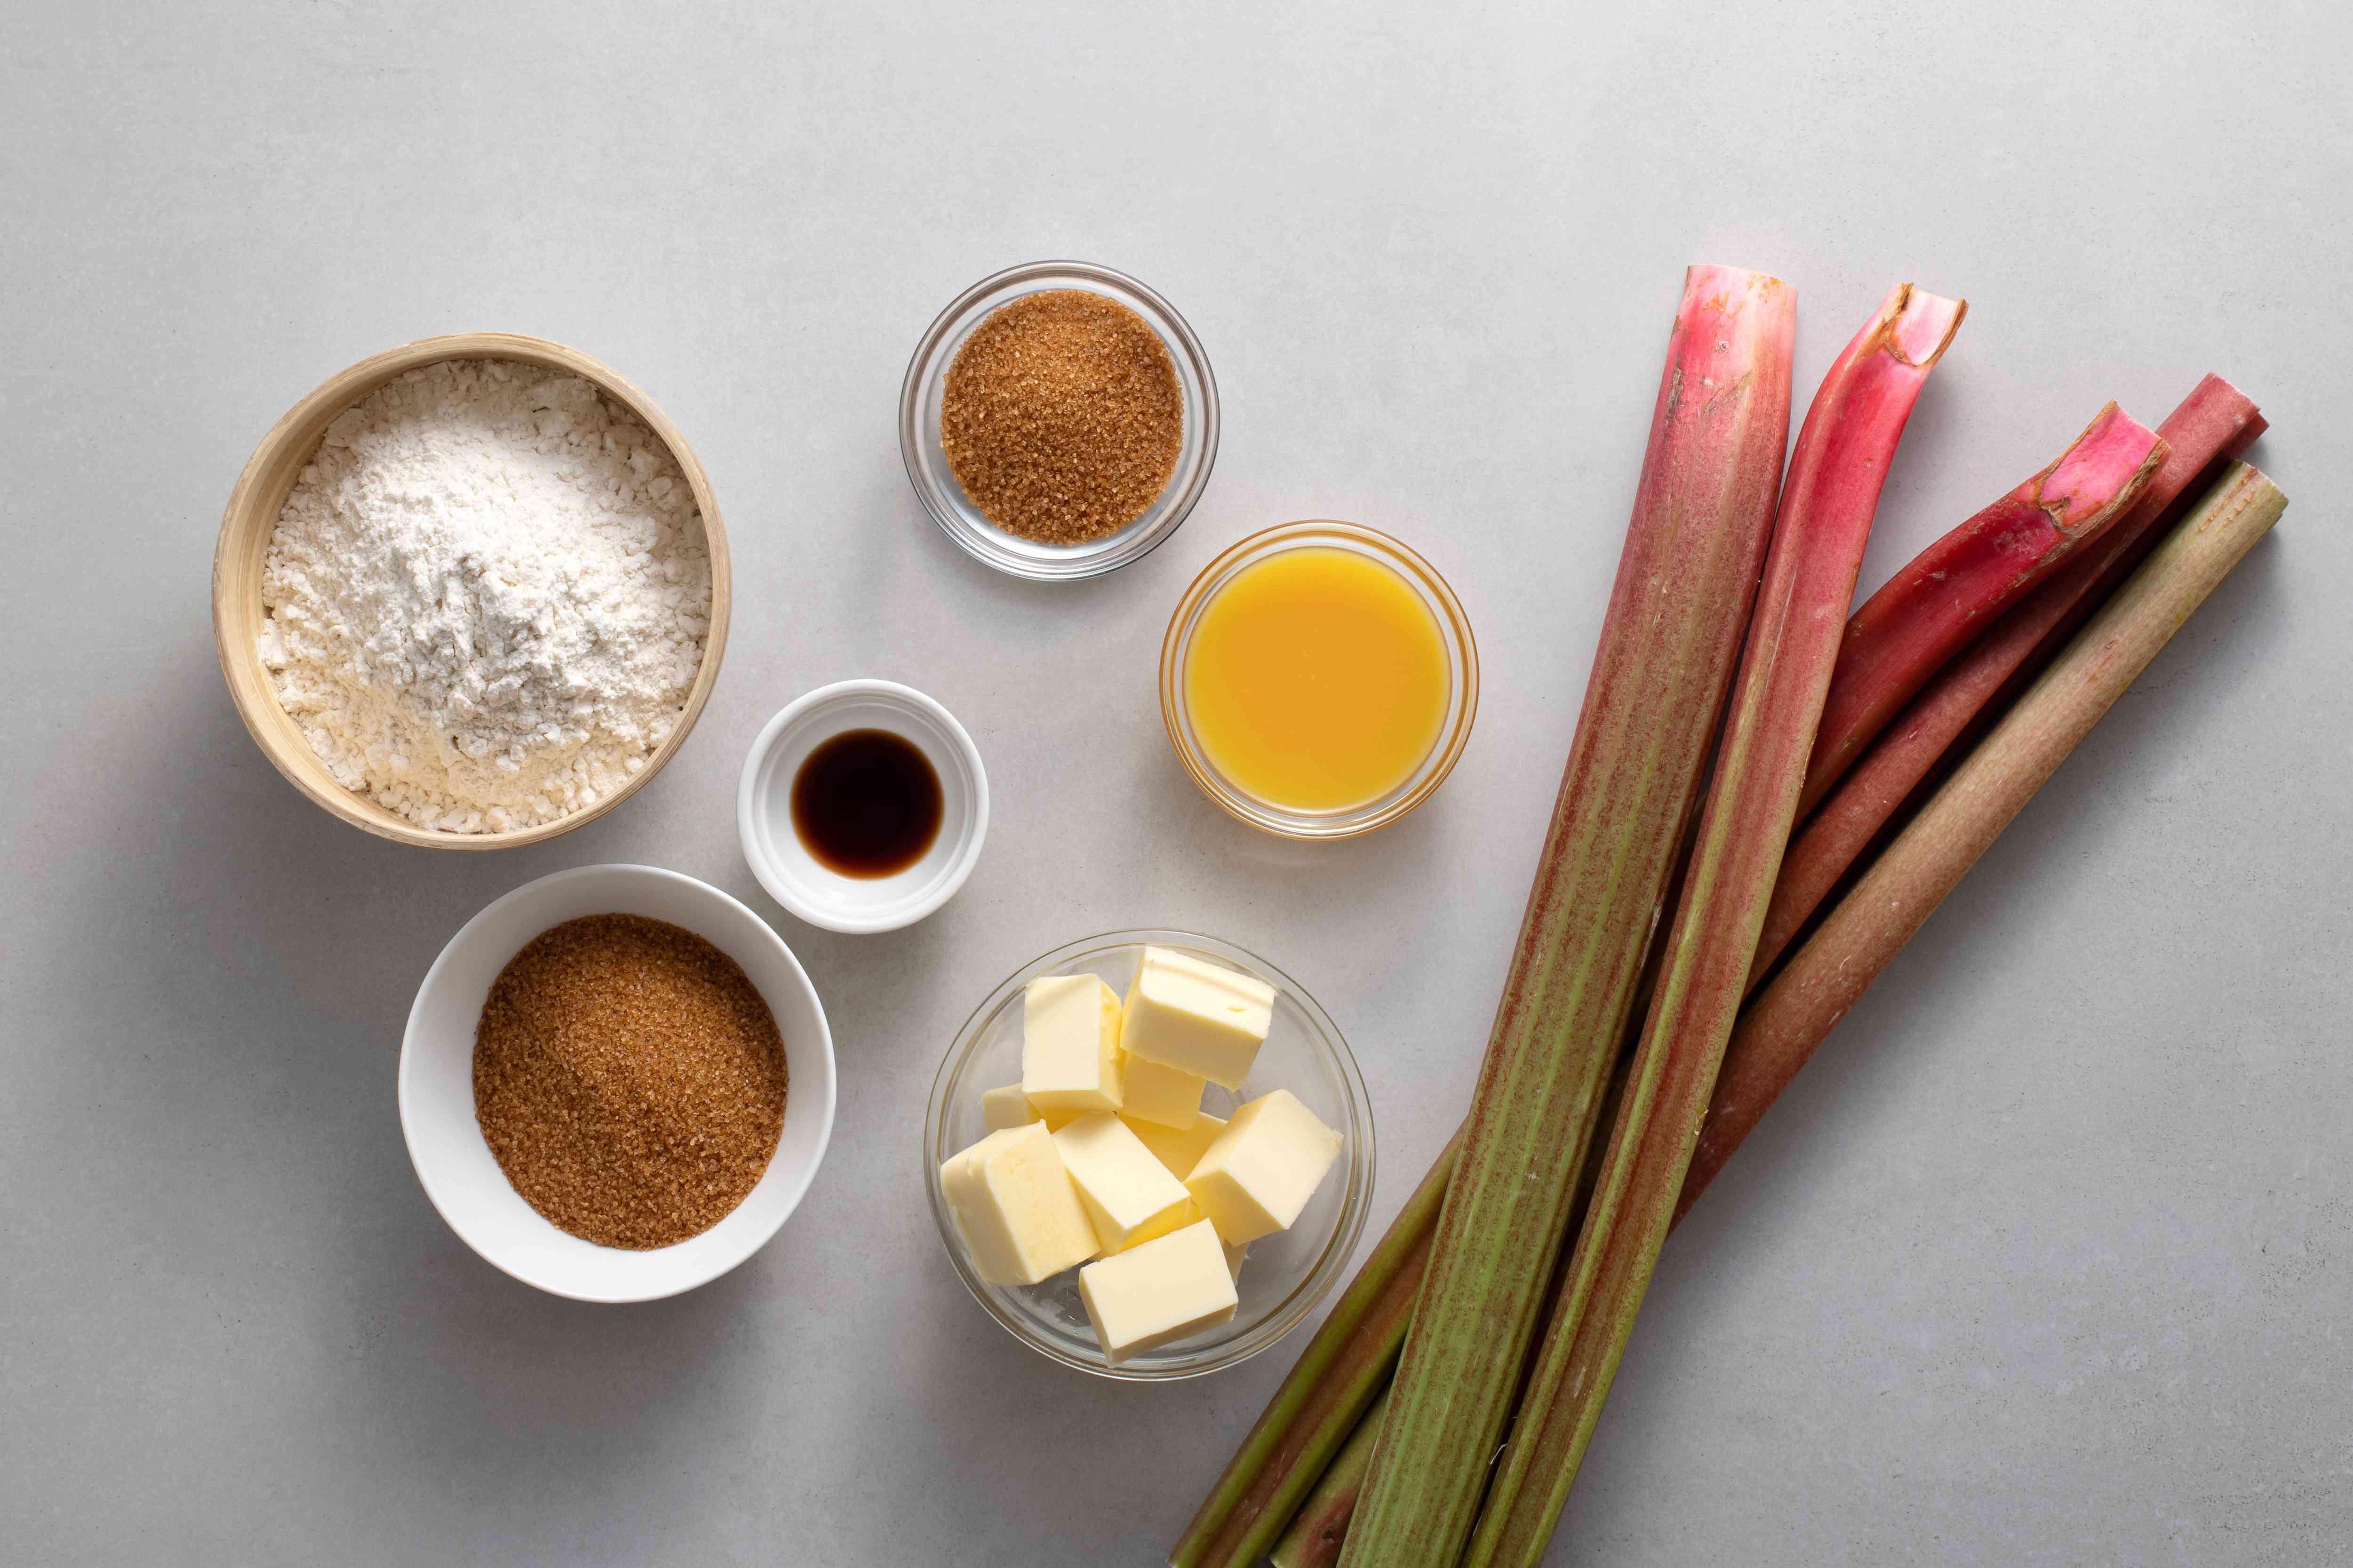 Roasted Rhubarb and Vanilla Crumble ingredients